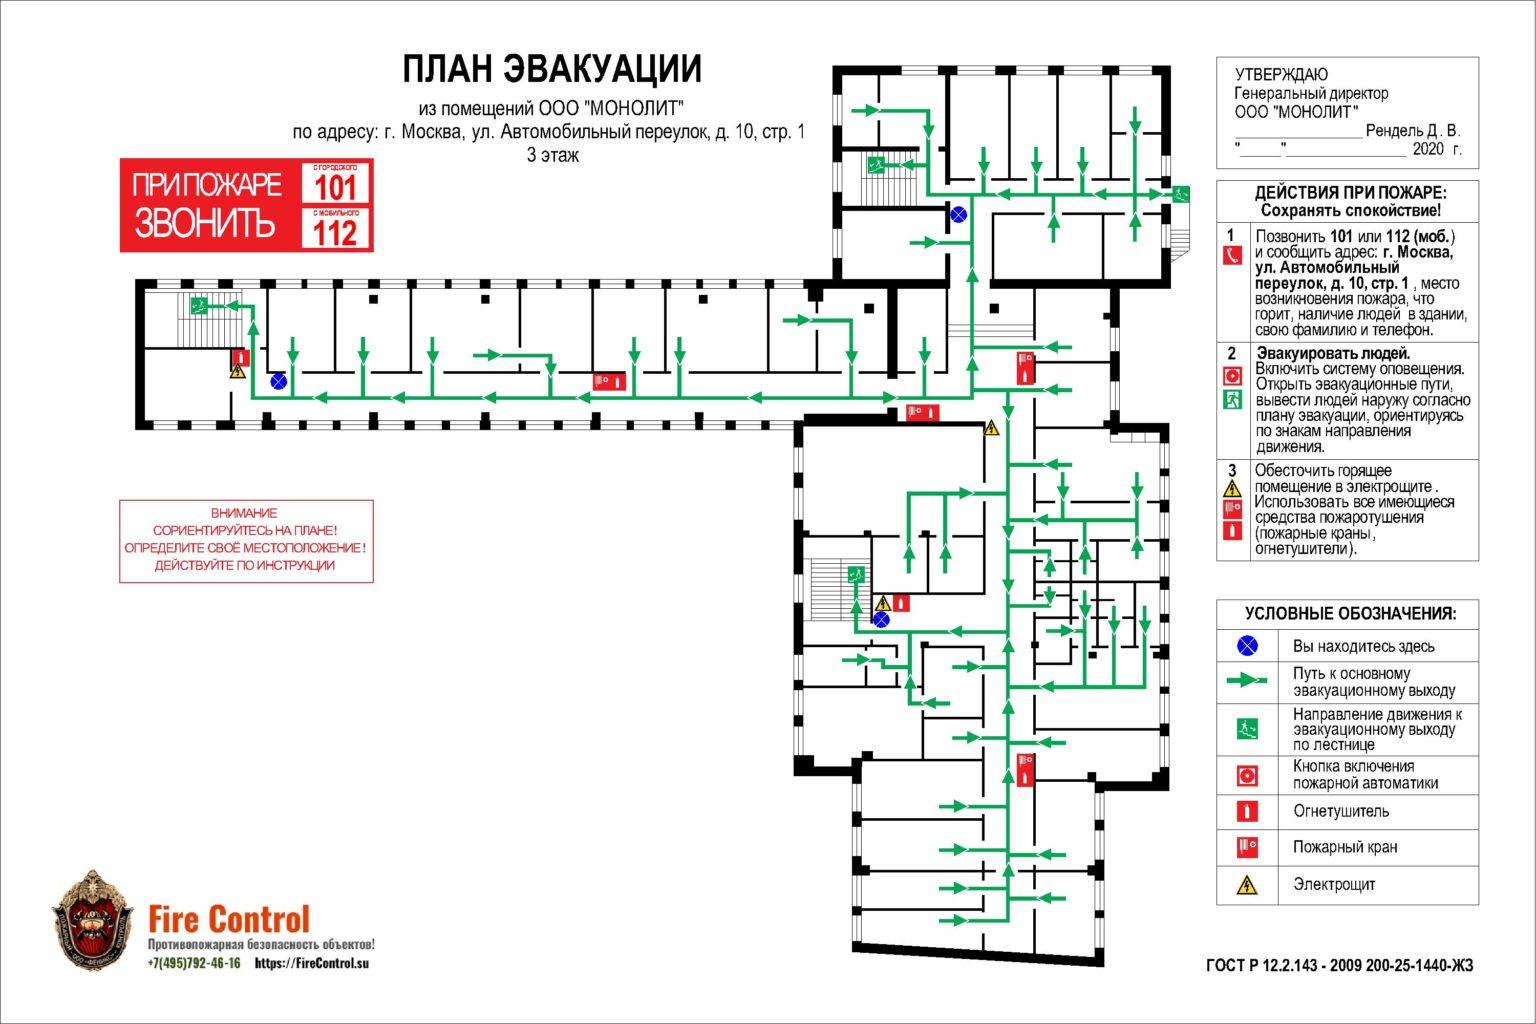 Схема плана эвакуации